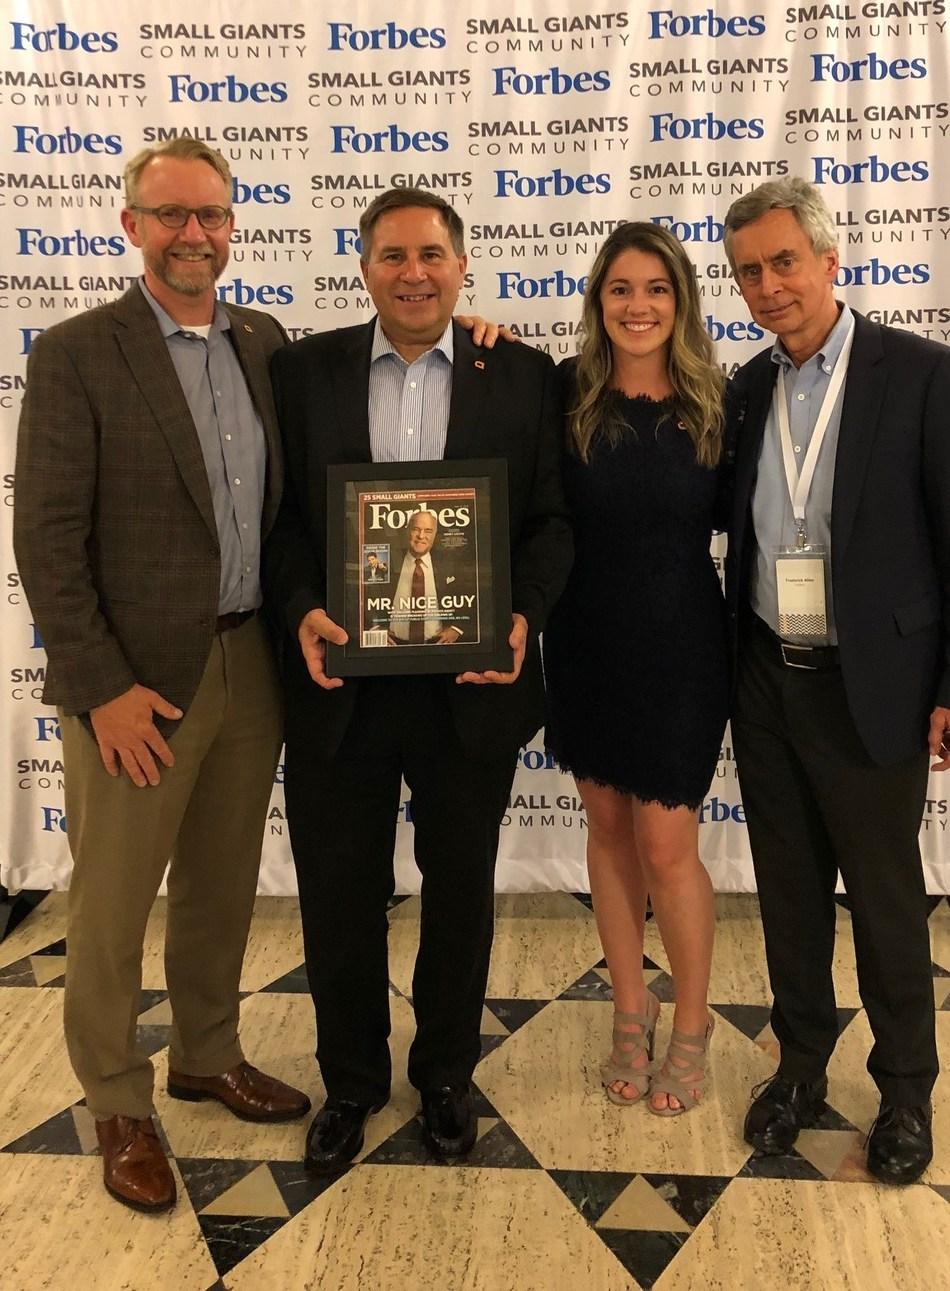 From left: Steve Brindle (Partner, Advoco), Marty Osborn (Partner, Advoco), Mary Devine (Director of Marketing & Events, Advoco), Fred Allen (Leadership Editor, Forbes.com)